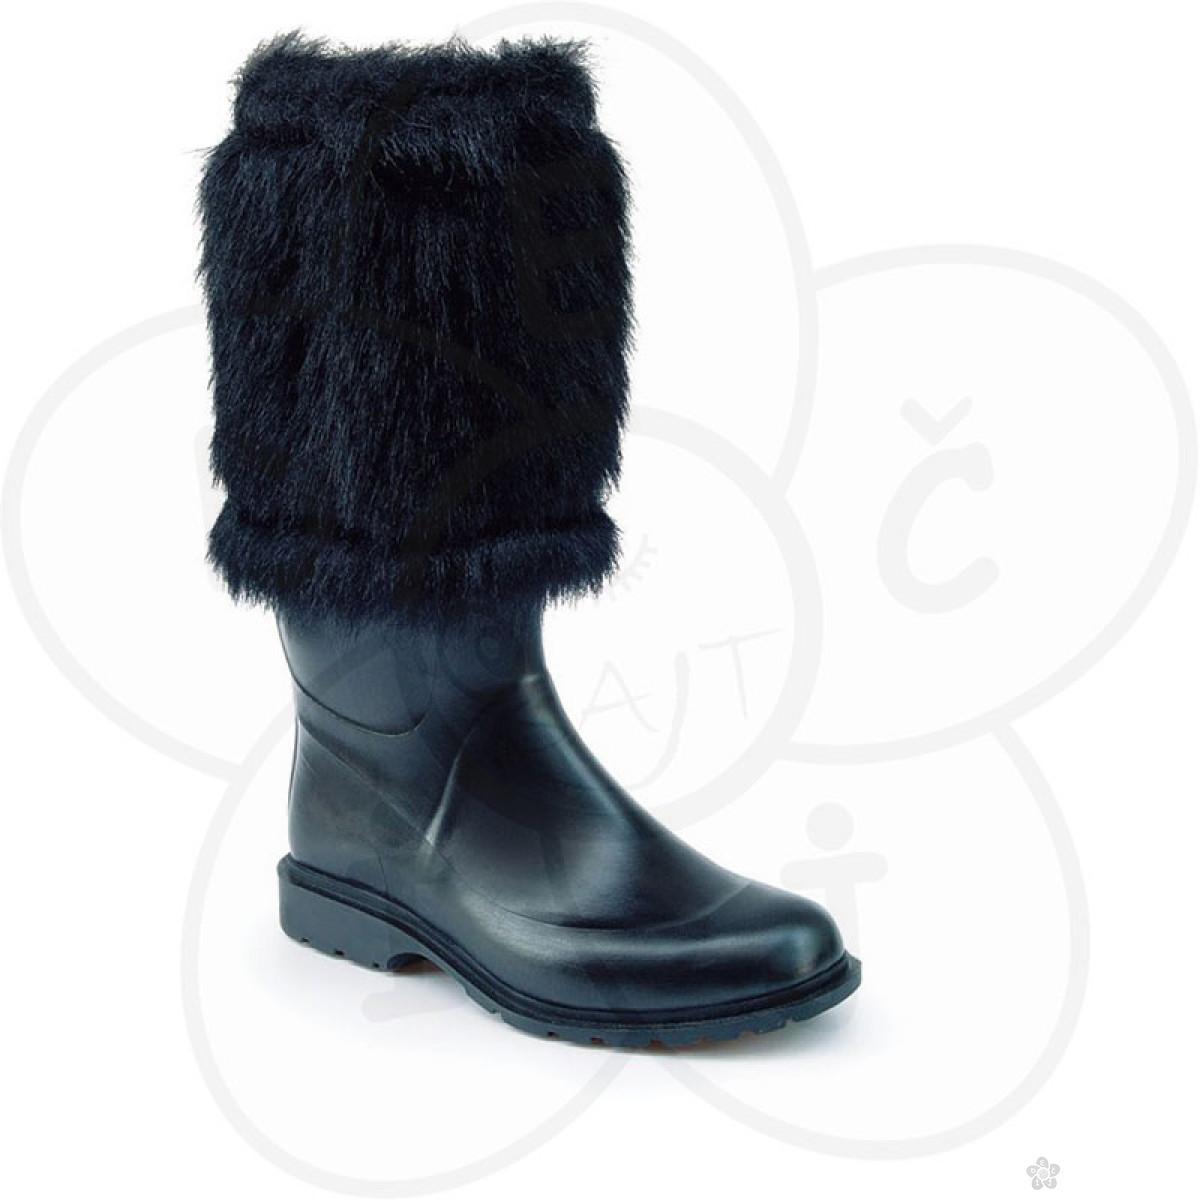 Maniera čizme Classic&Fur, crne